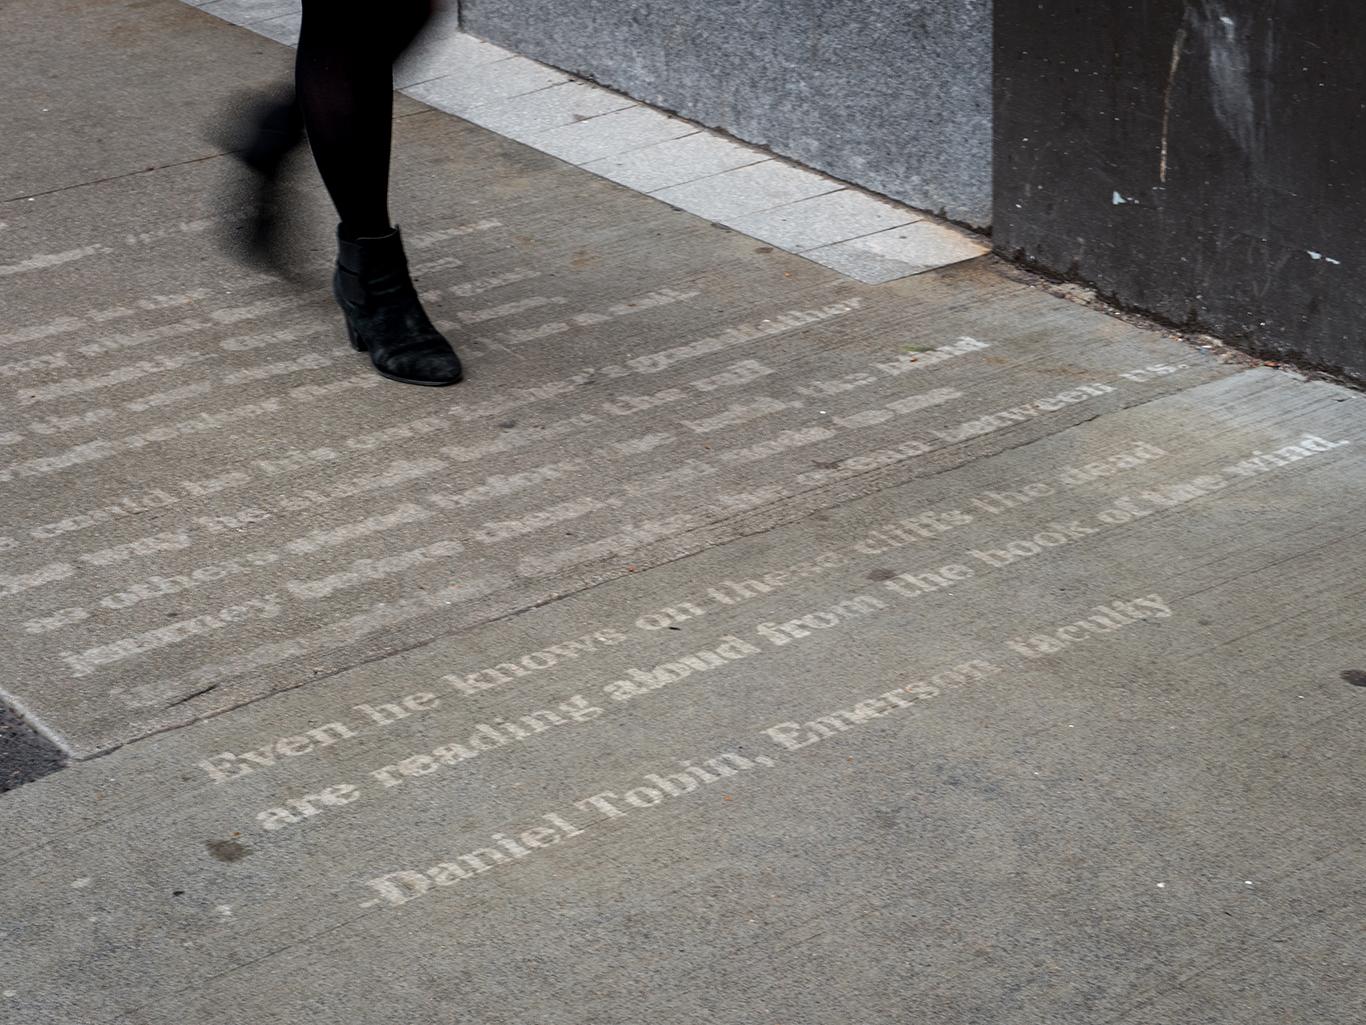 Walking on sidewalk poem